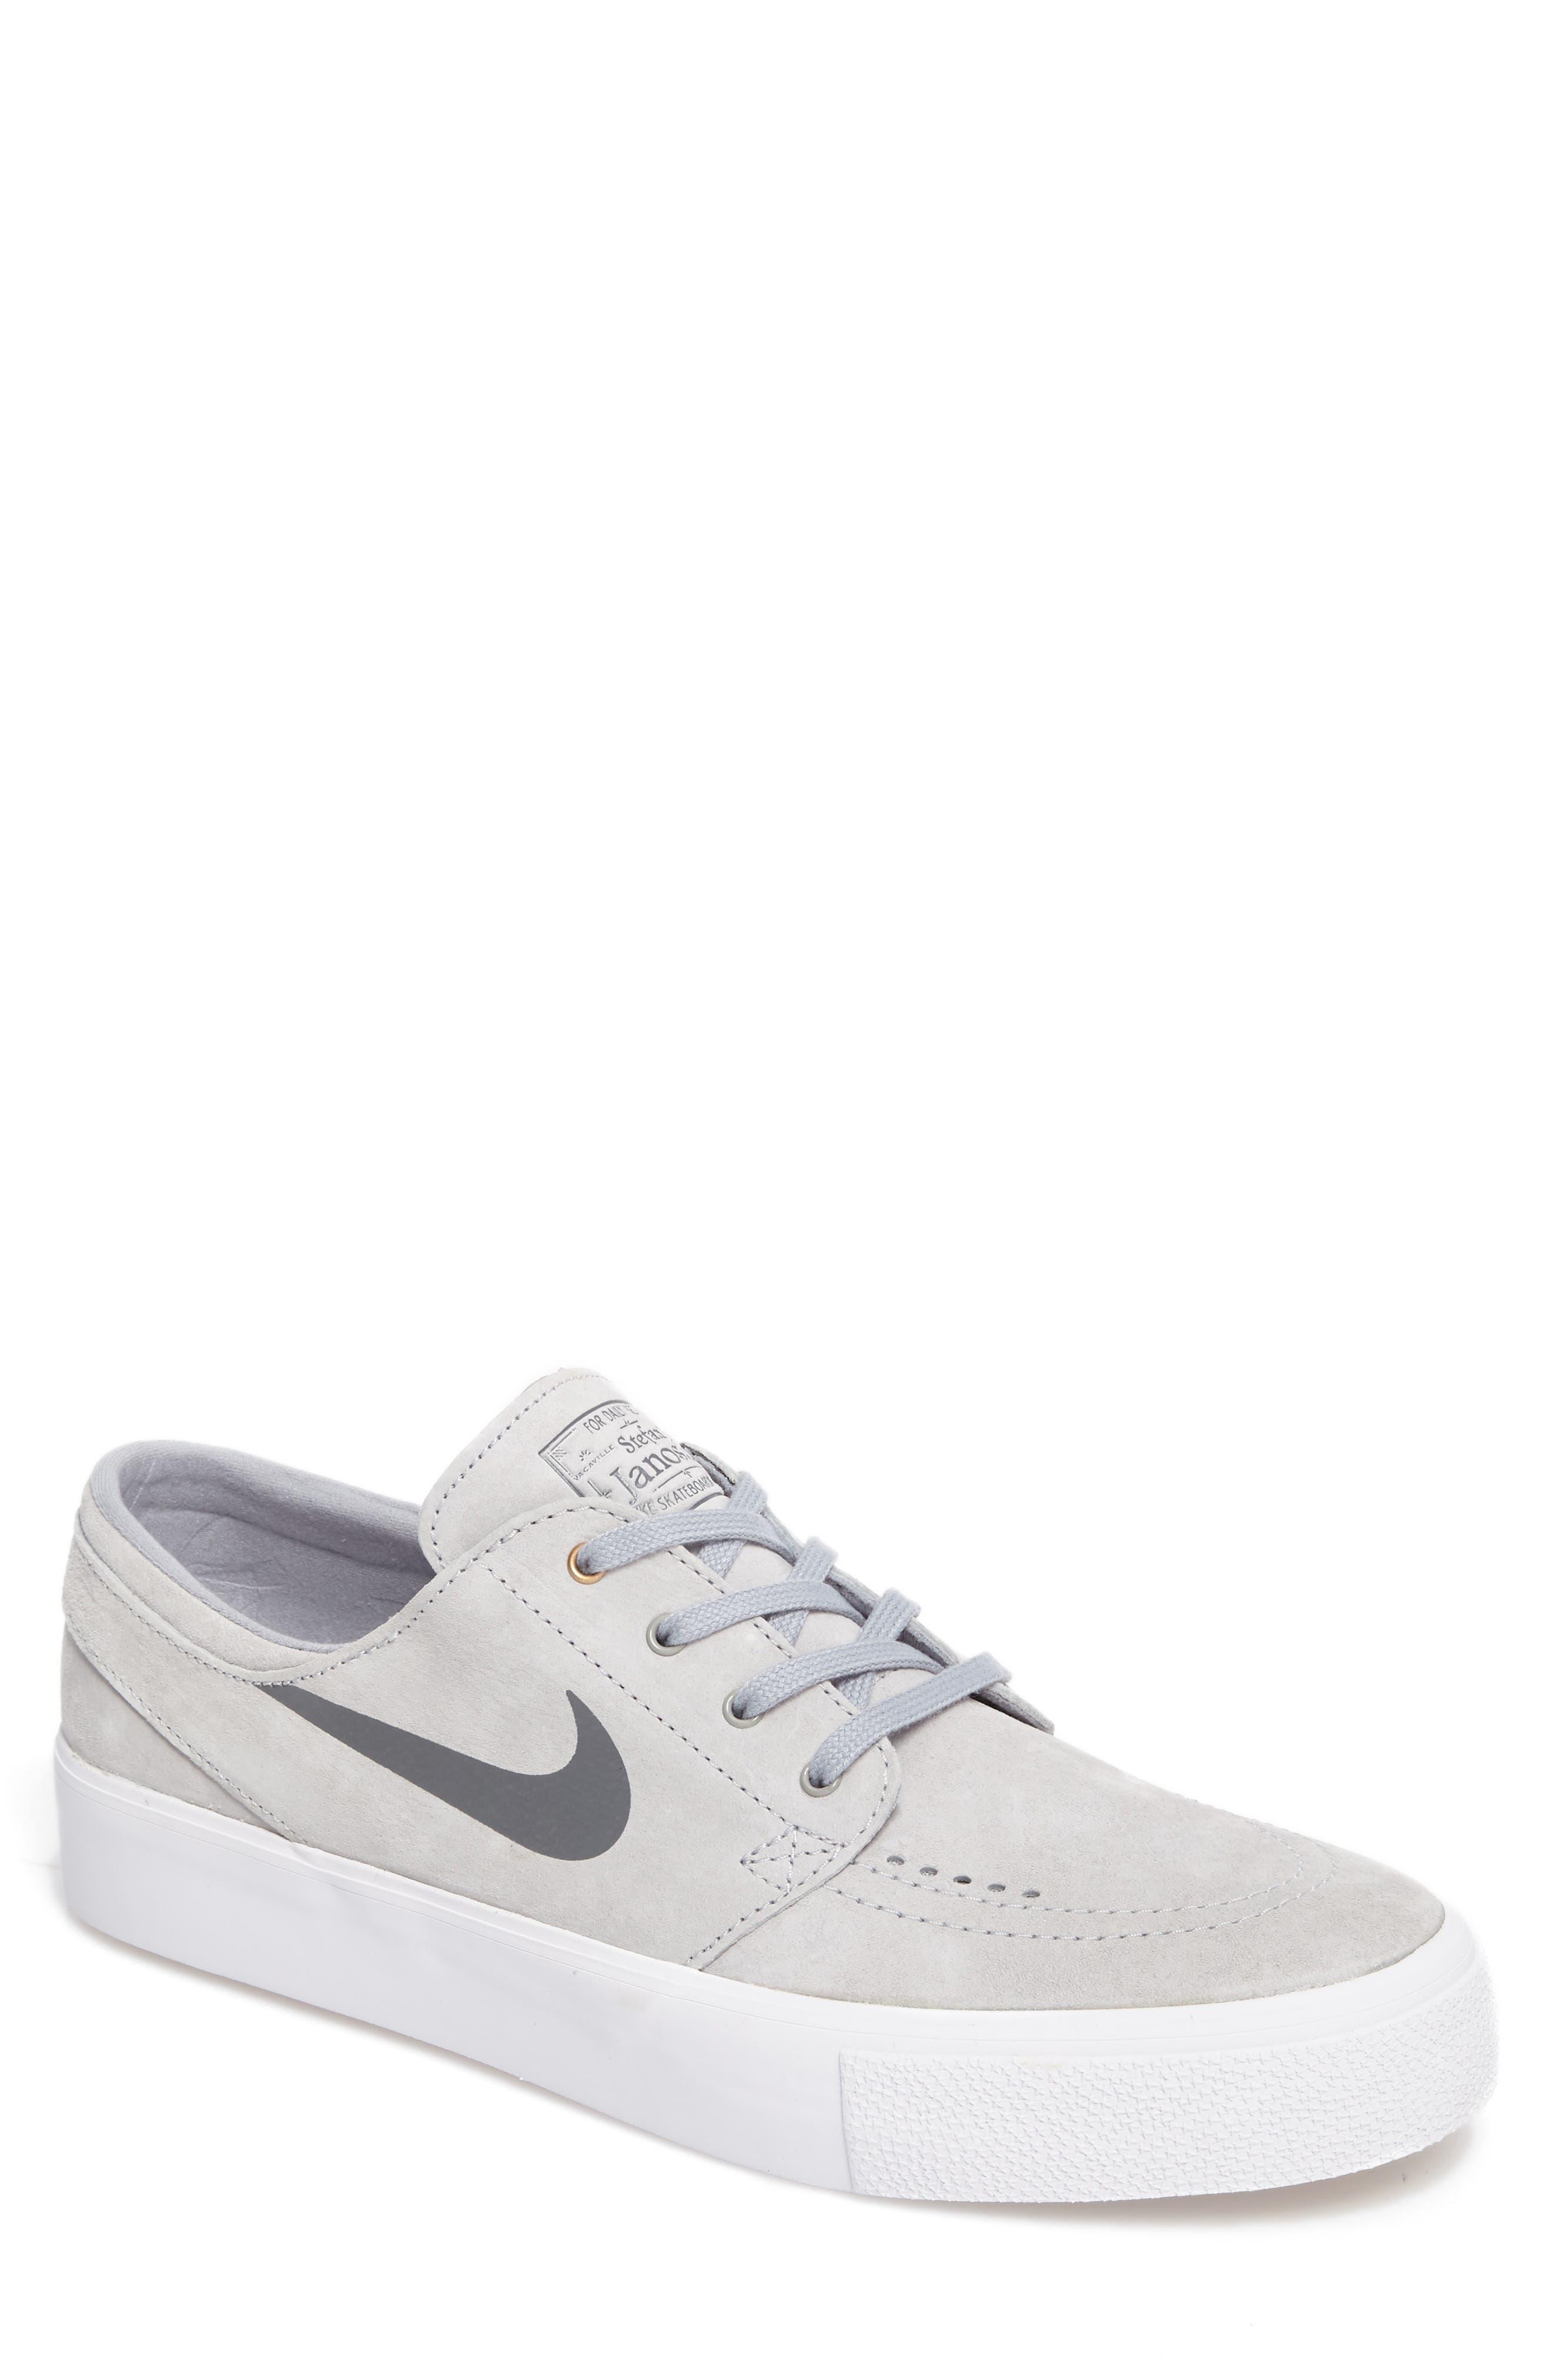 Alternate Image 1 Selected - Nike Zoom Stefan Janoski Premium Skate Sneaker (Men)